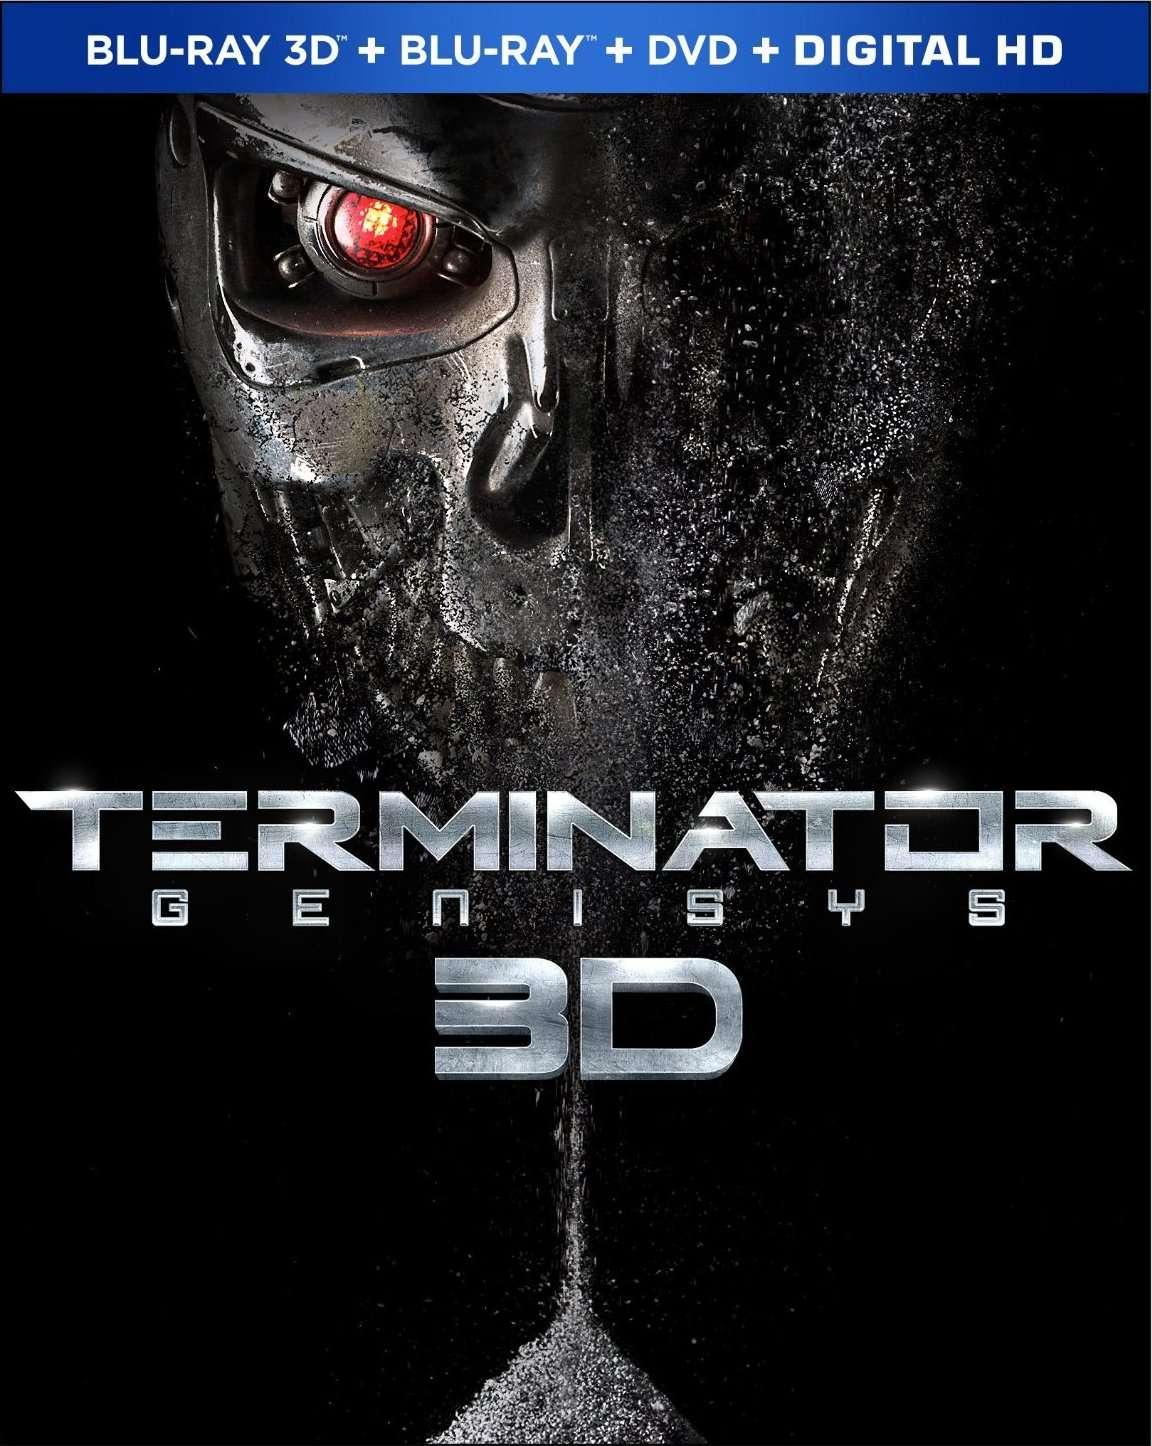 Terminator Genisys (2015) iso Blu Ray 3D Full DD ITA True-HD ENG Sub